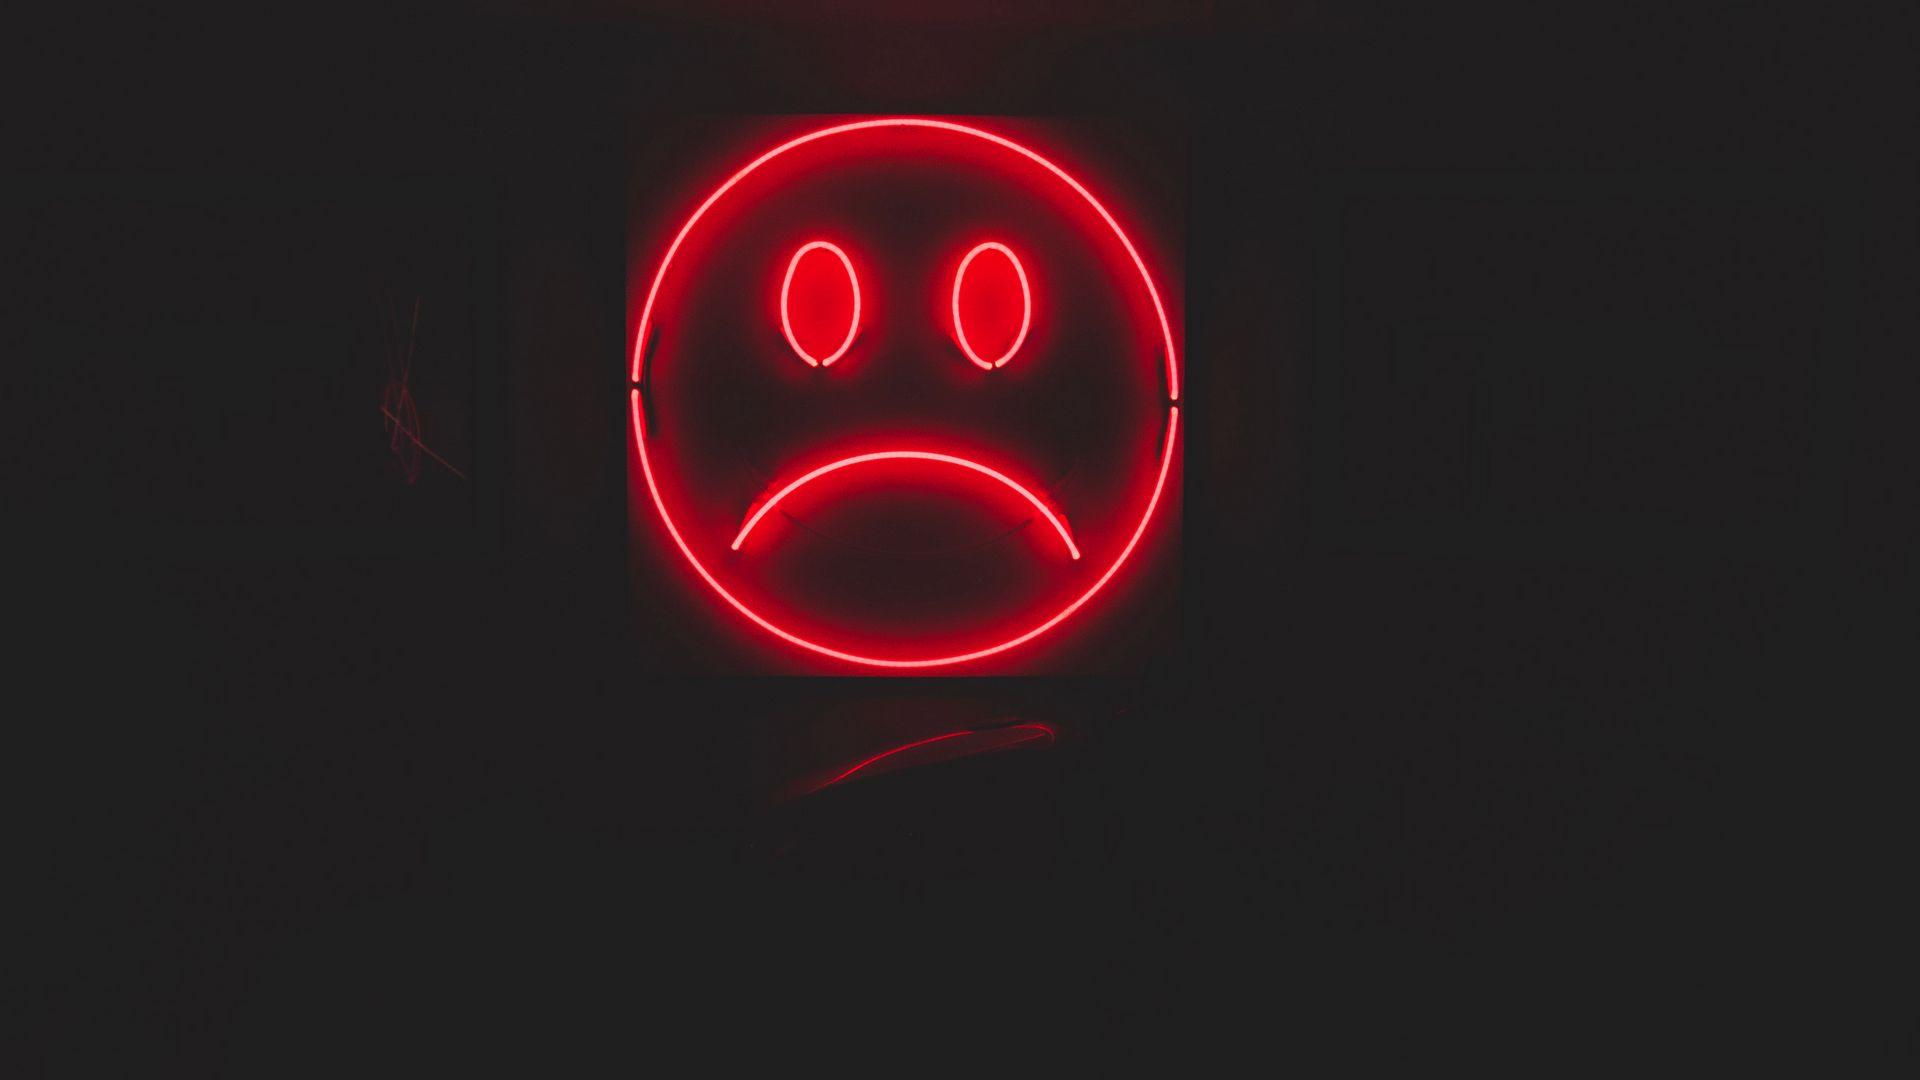 1920x1080 Wallpaper smile, smiley, sad, neon, red, dark